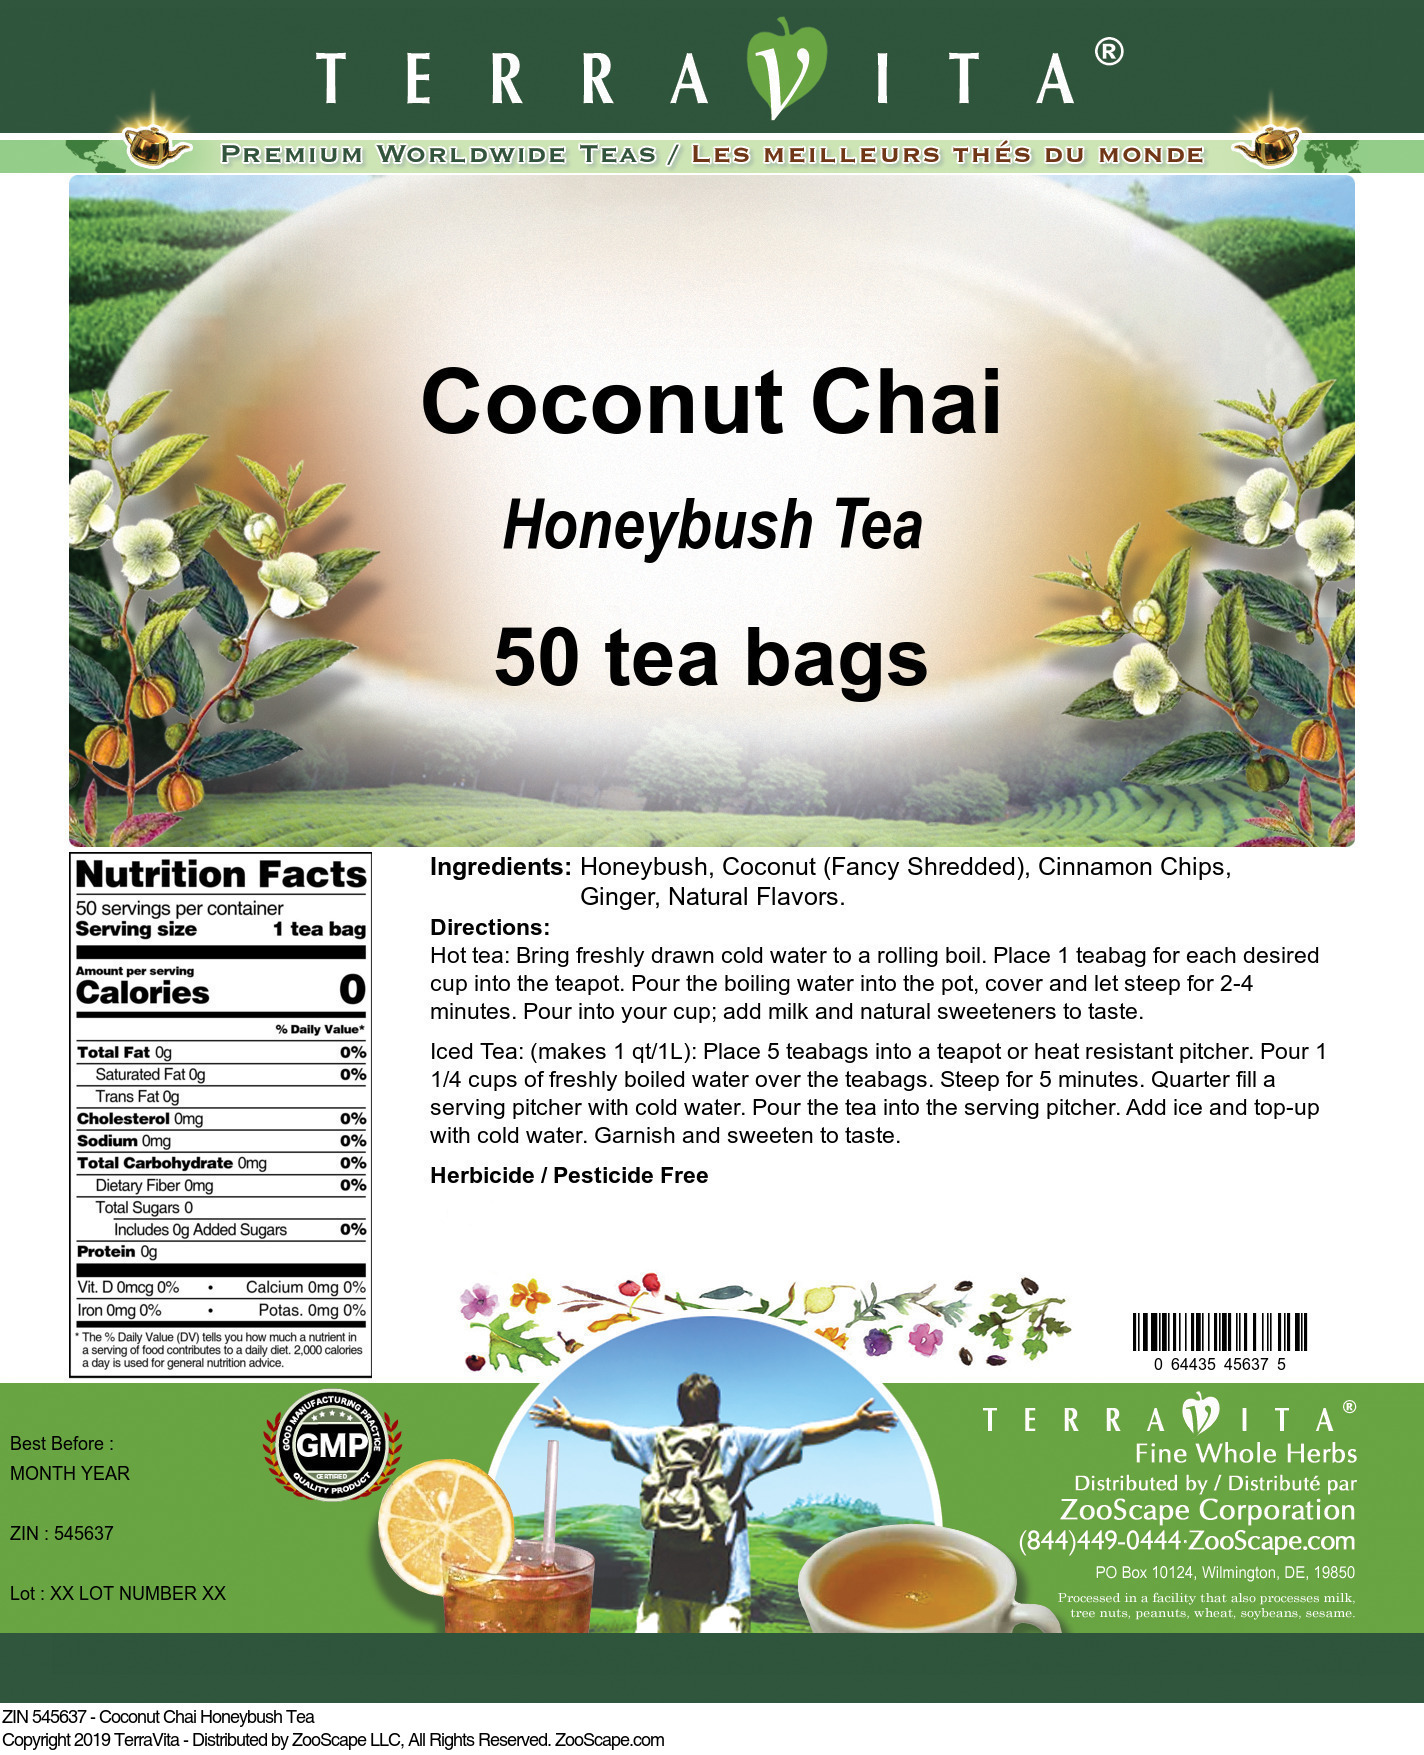 Coconut Chai Honeybush Tea